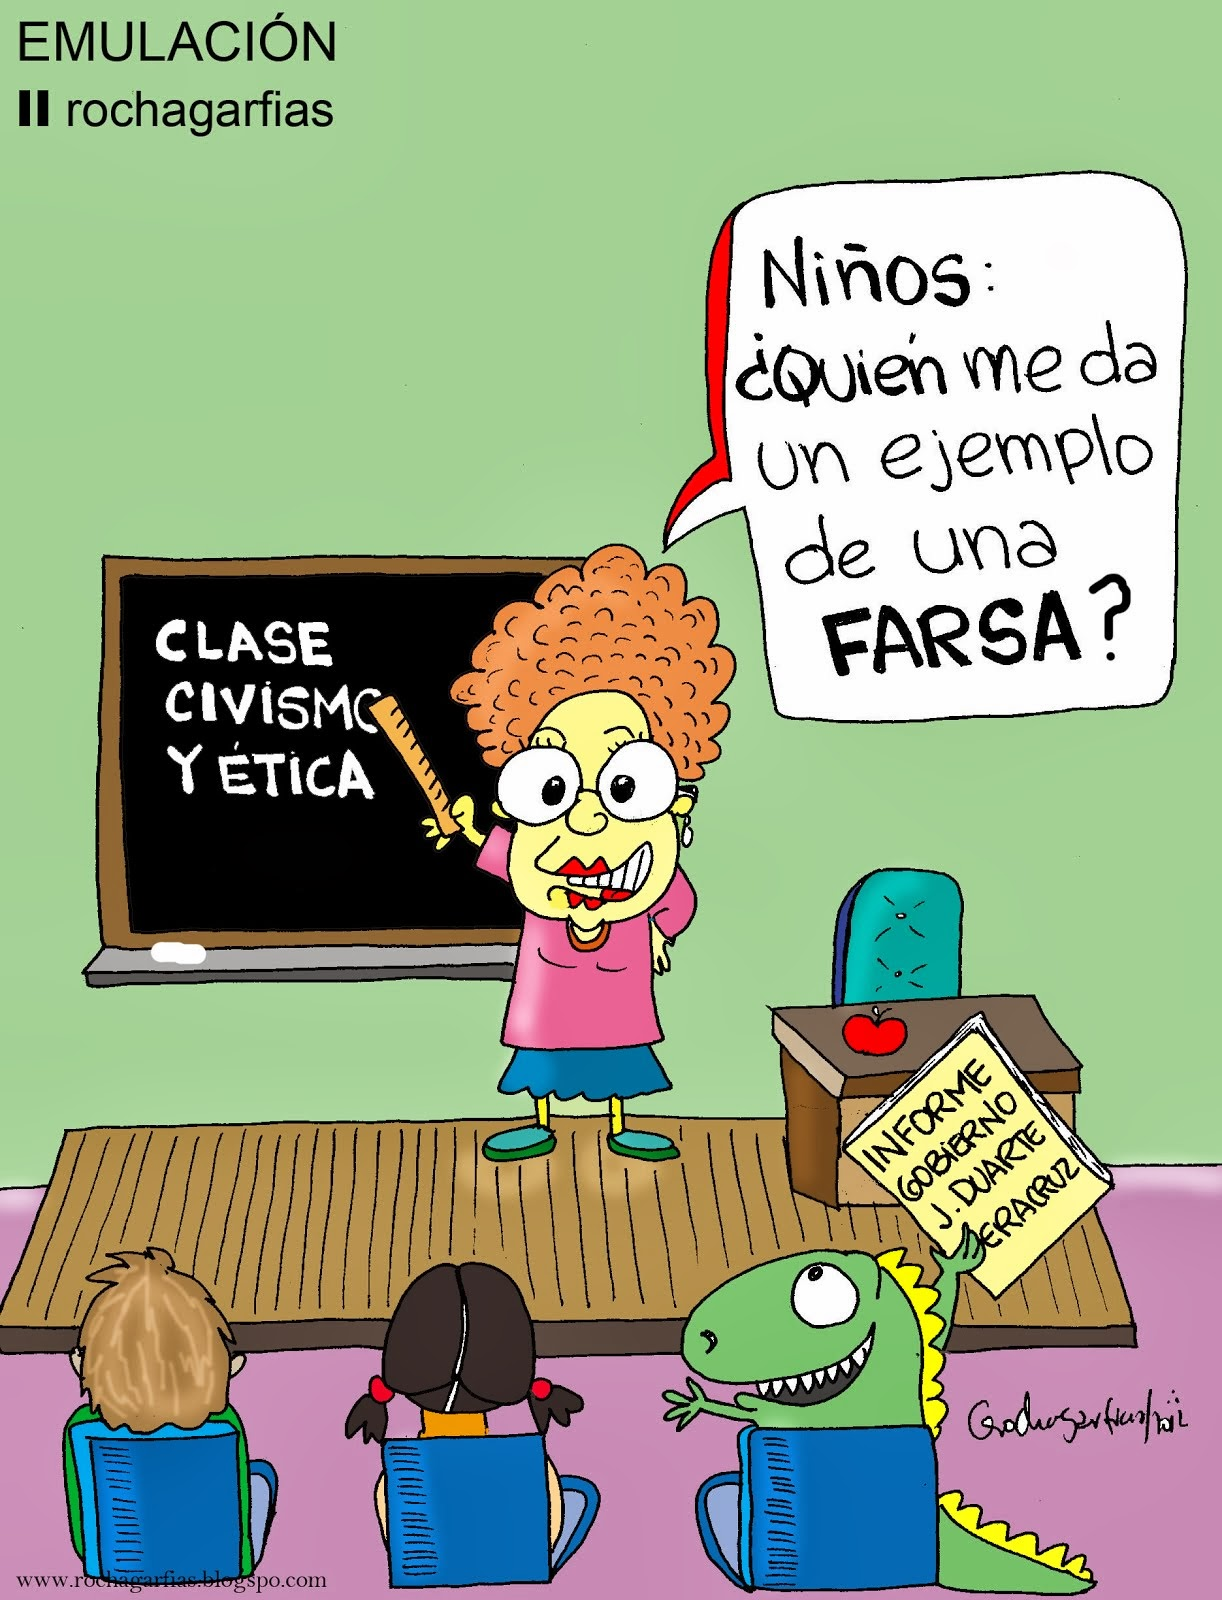 Veracruz: emulación de FARSA.